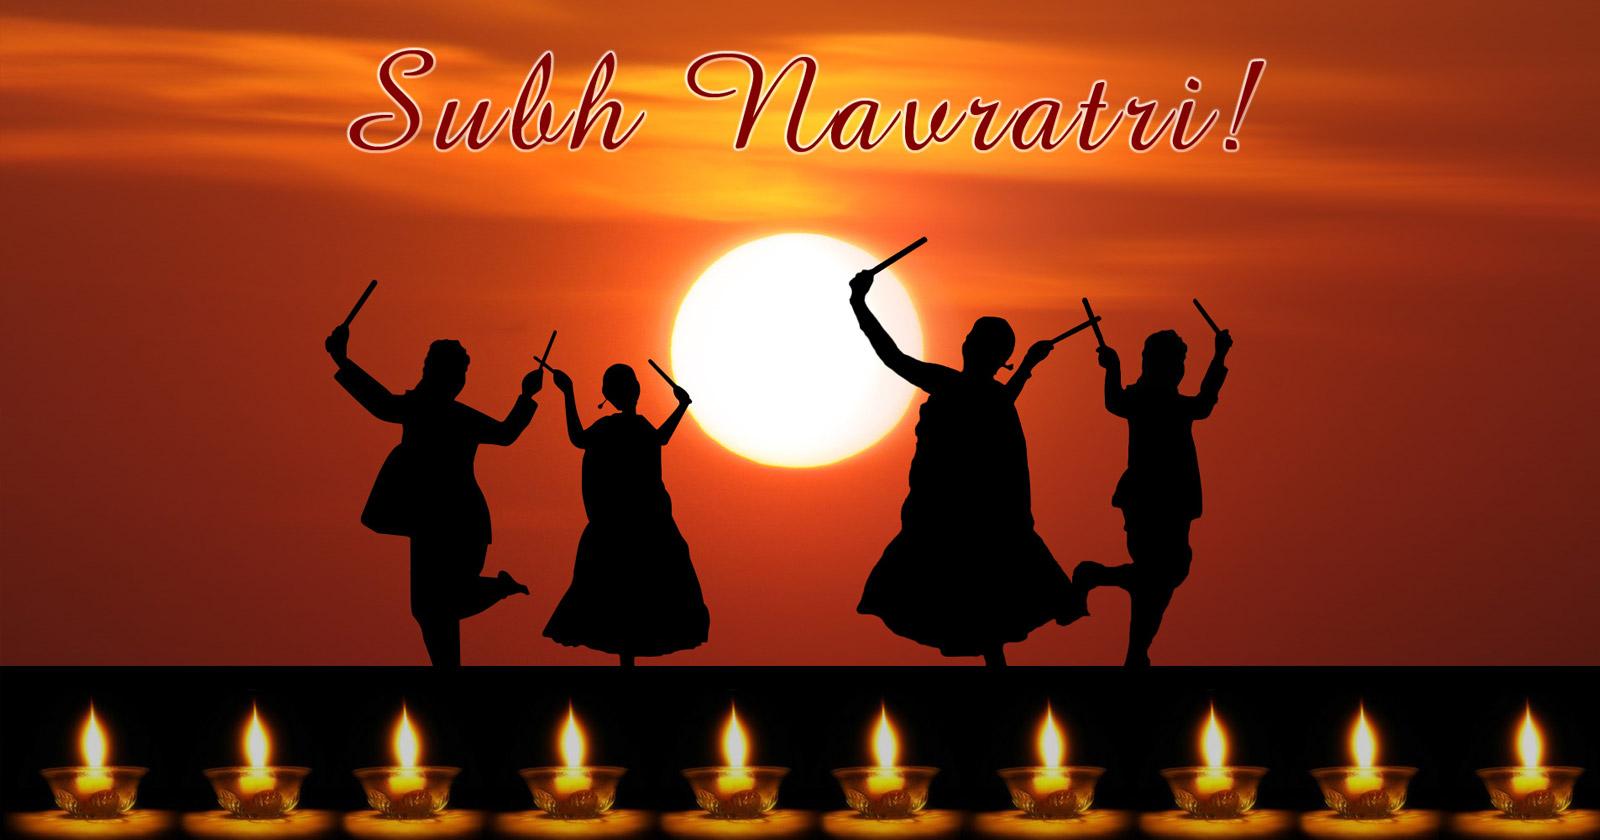 Theholidayspot Holidays And Festivals Celebrations